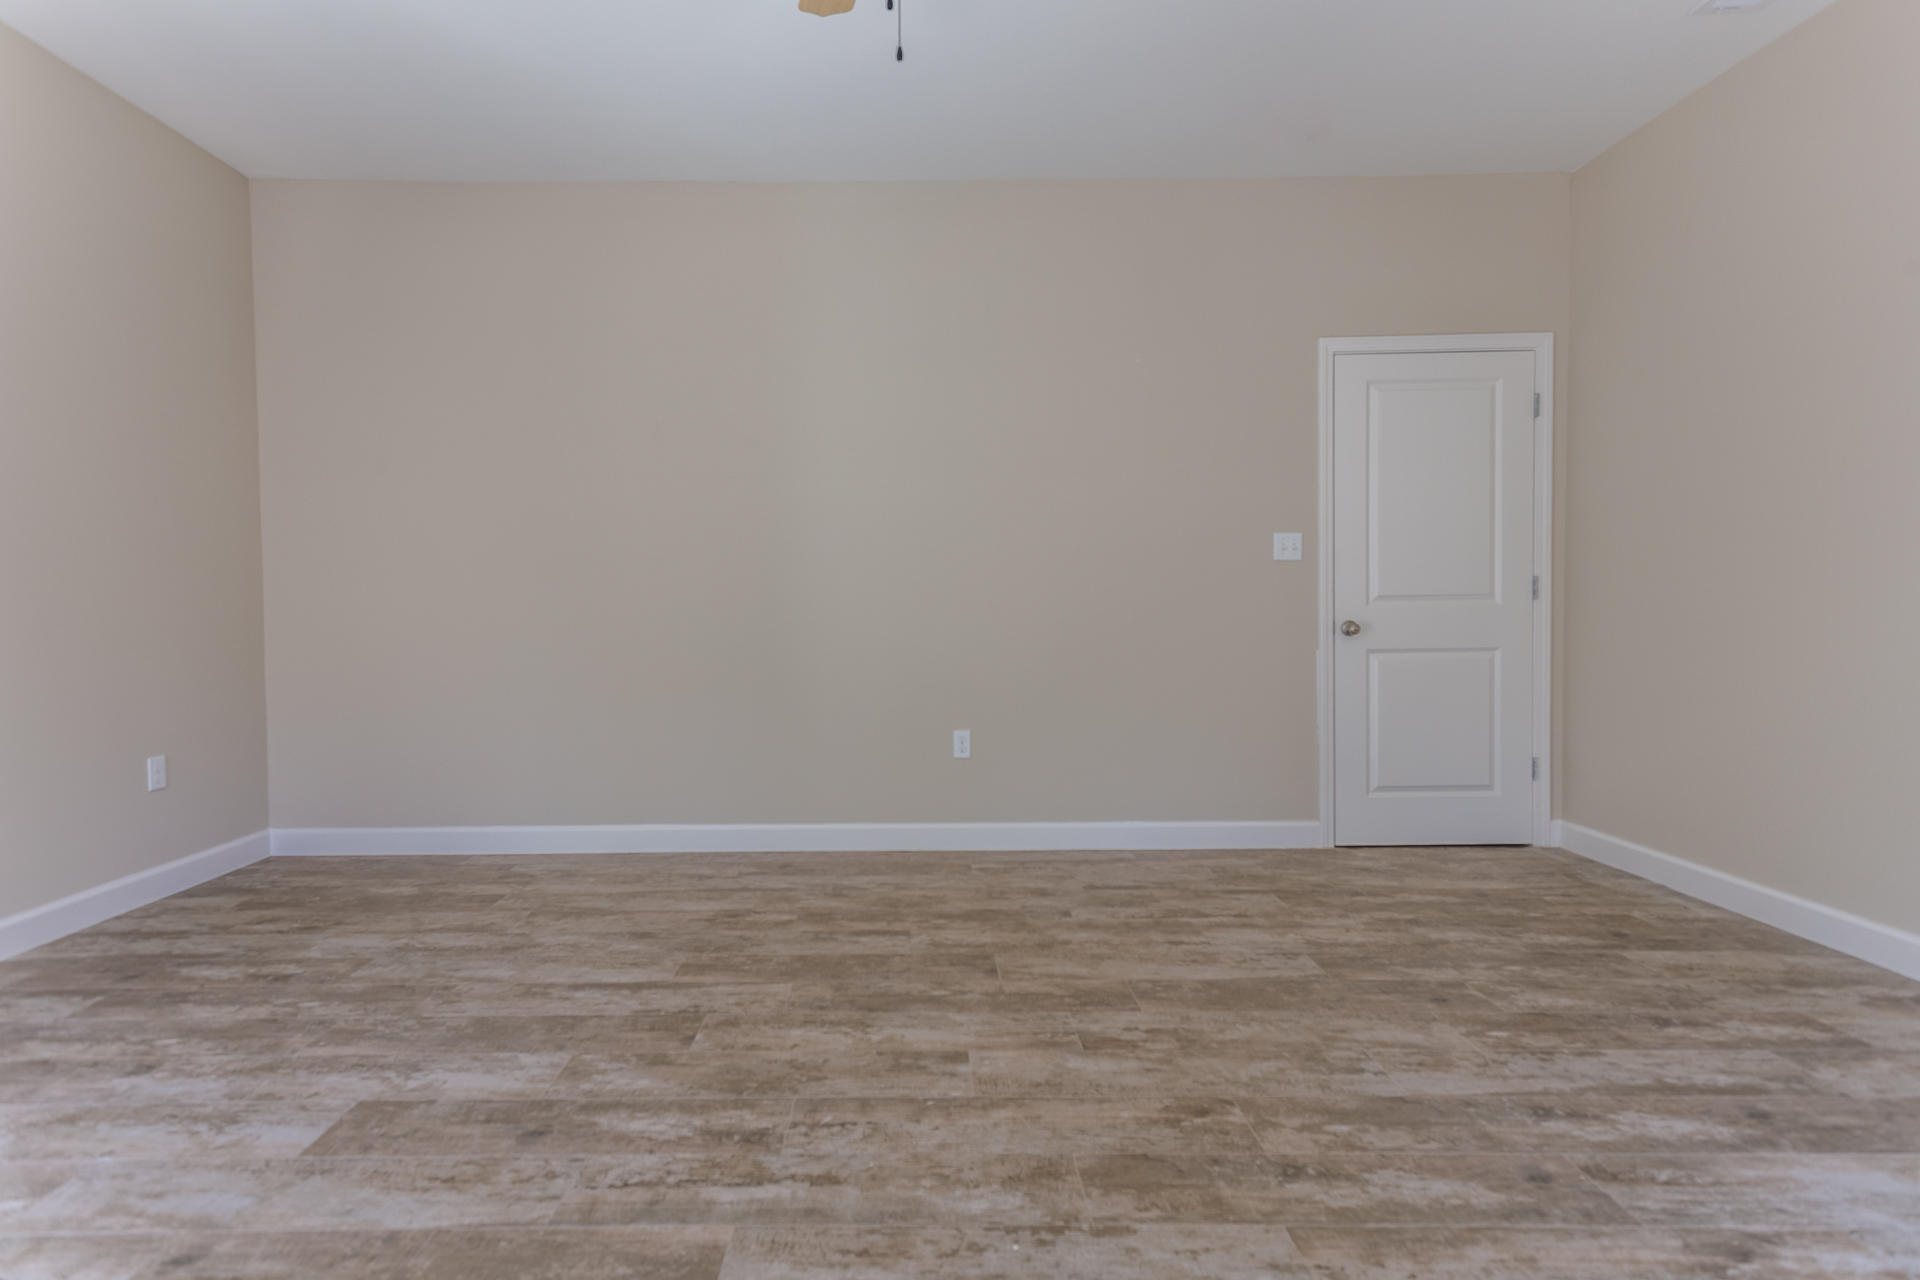 373 Indian Woman,Santa Rosa Beach,Florida 32459,3 Bedrooms Bedrooms,2 BathroomsBathrooms,Single family residence,Indian Woman,20131126143817002353000000